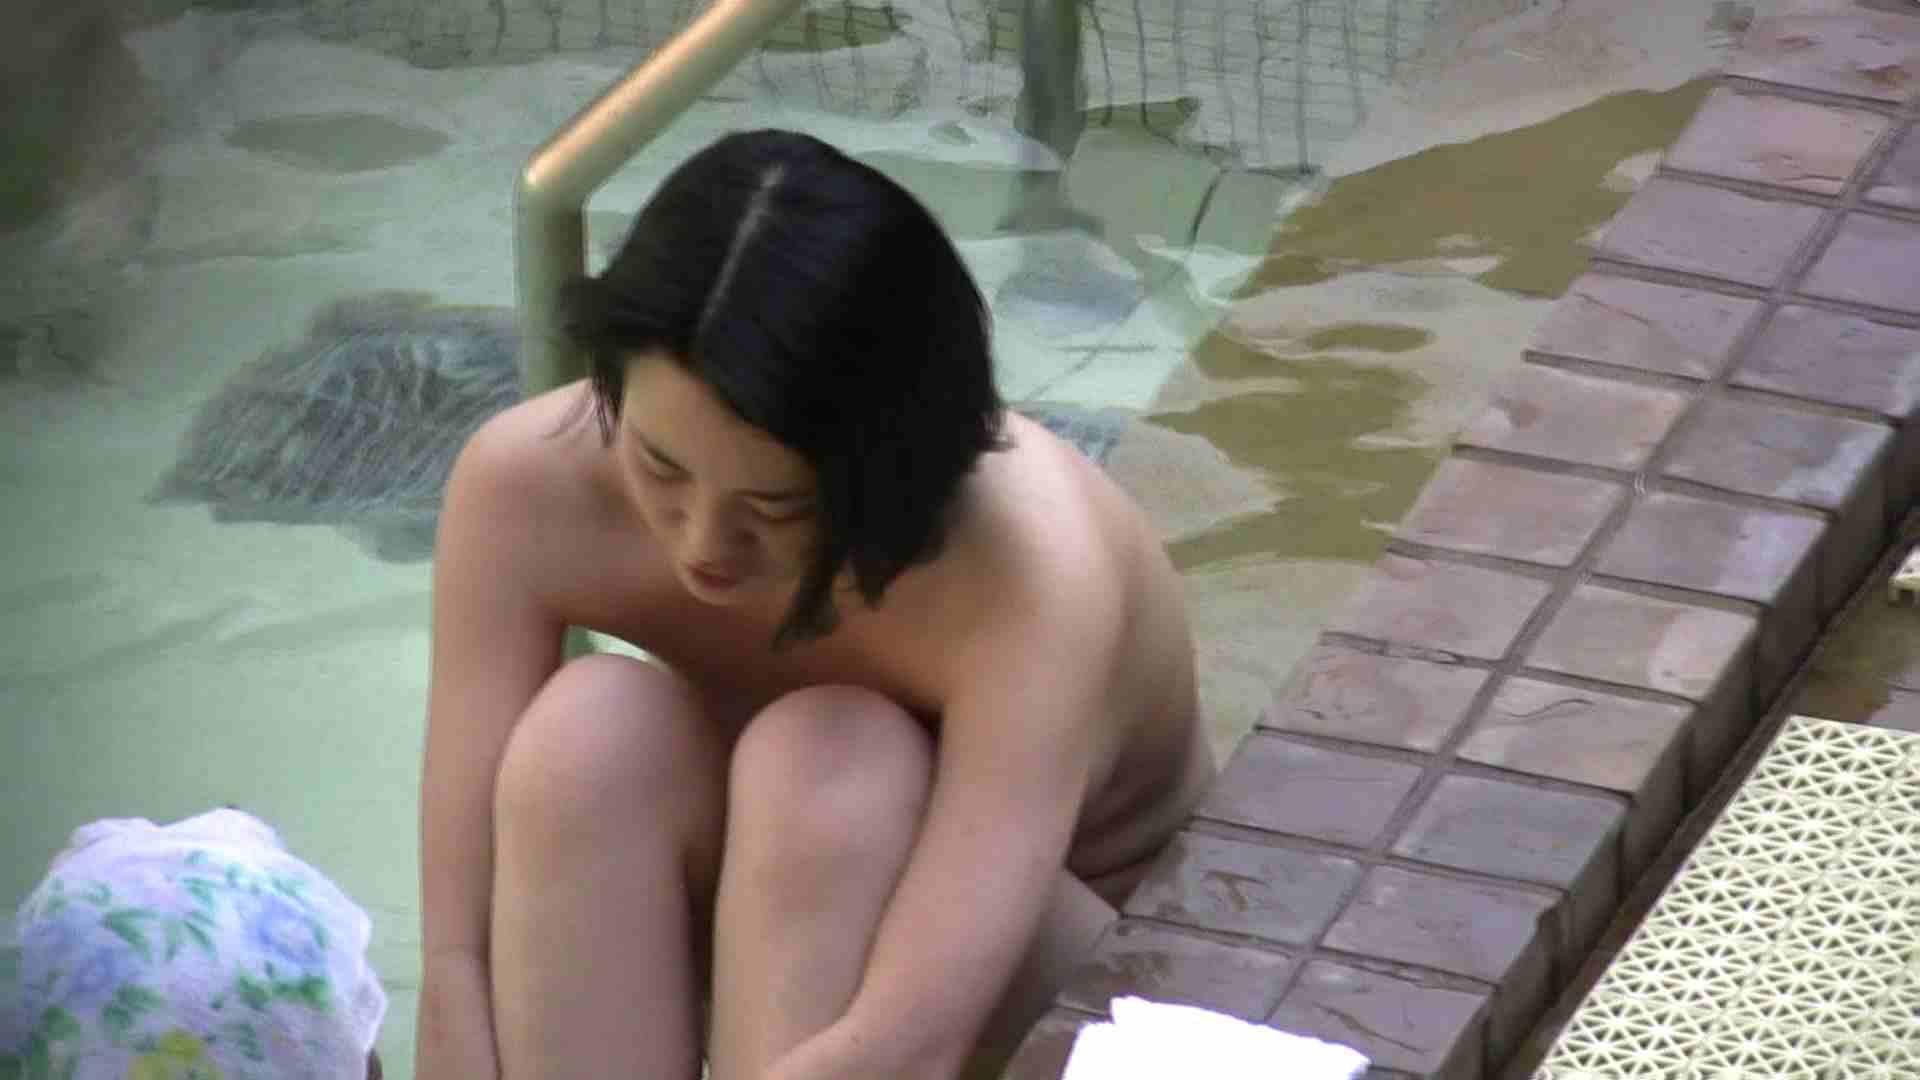 Aquaな露天風呂Vol.651 露天風呂突入   美しいOLの裸体  74pic 46